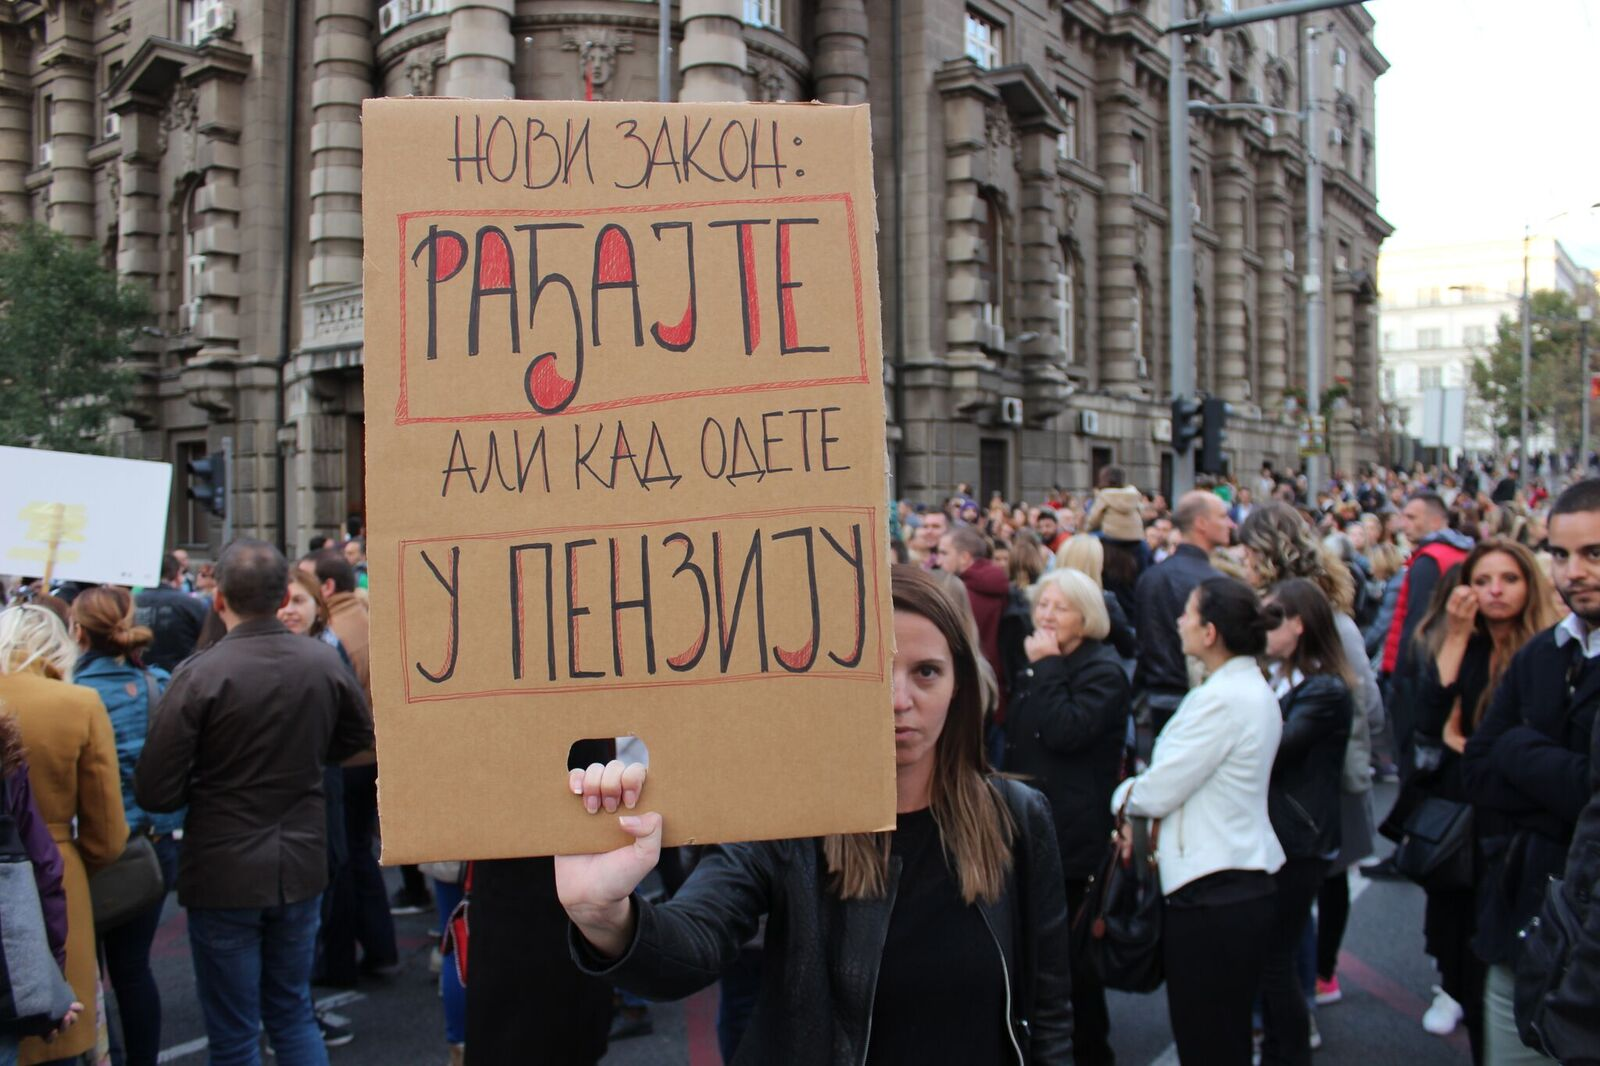 Foto: Nenad Porobić / Mašina